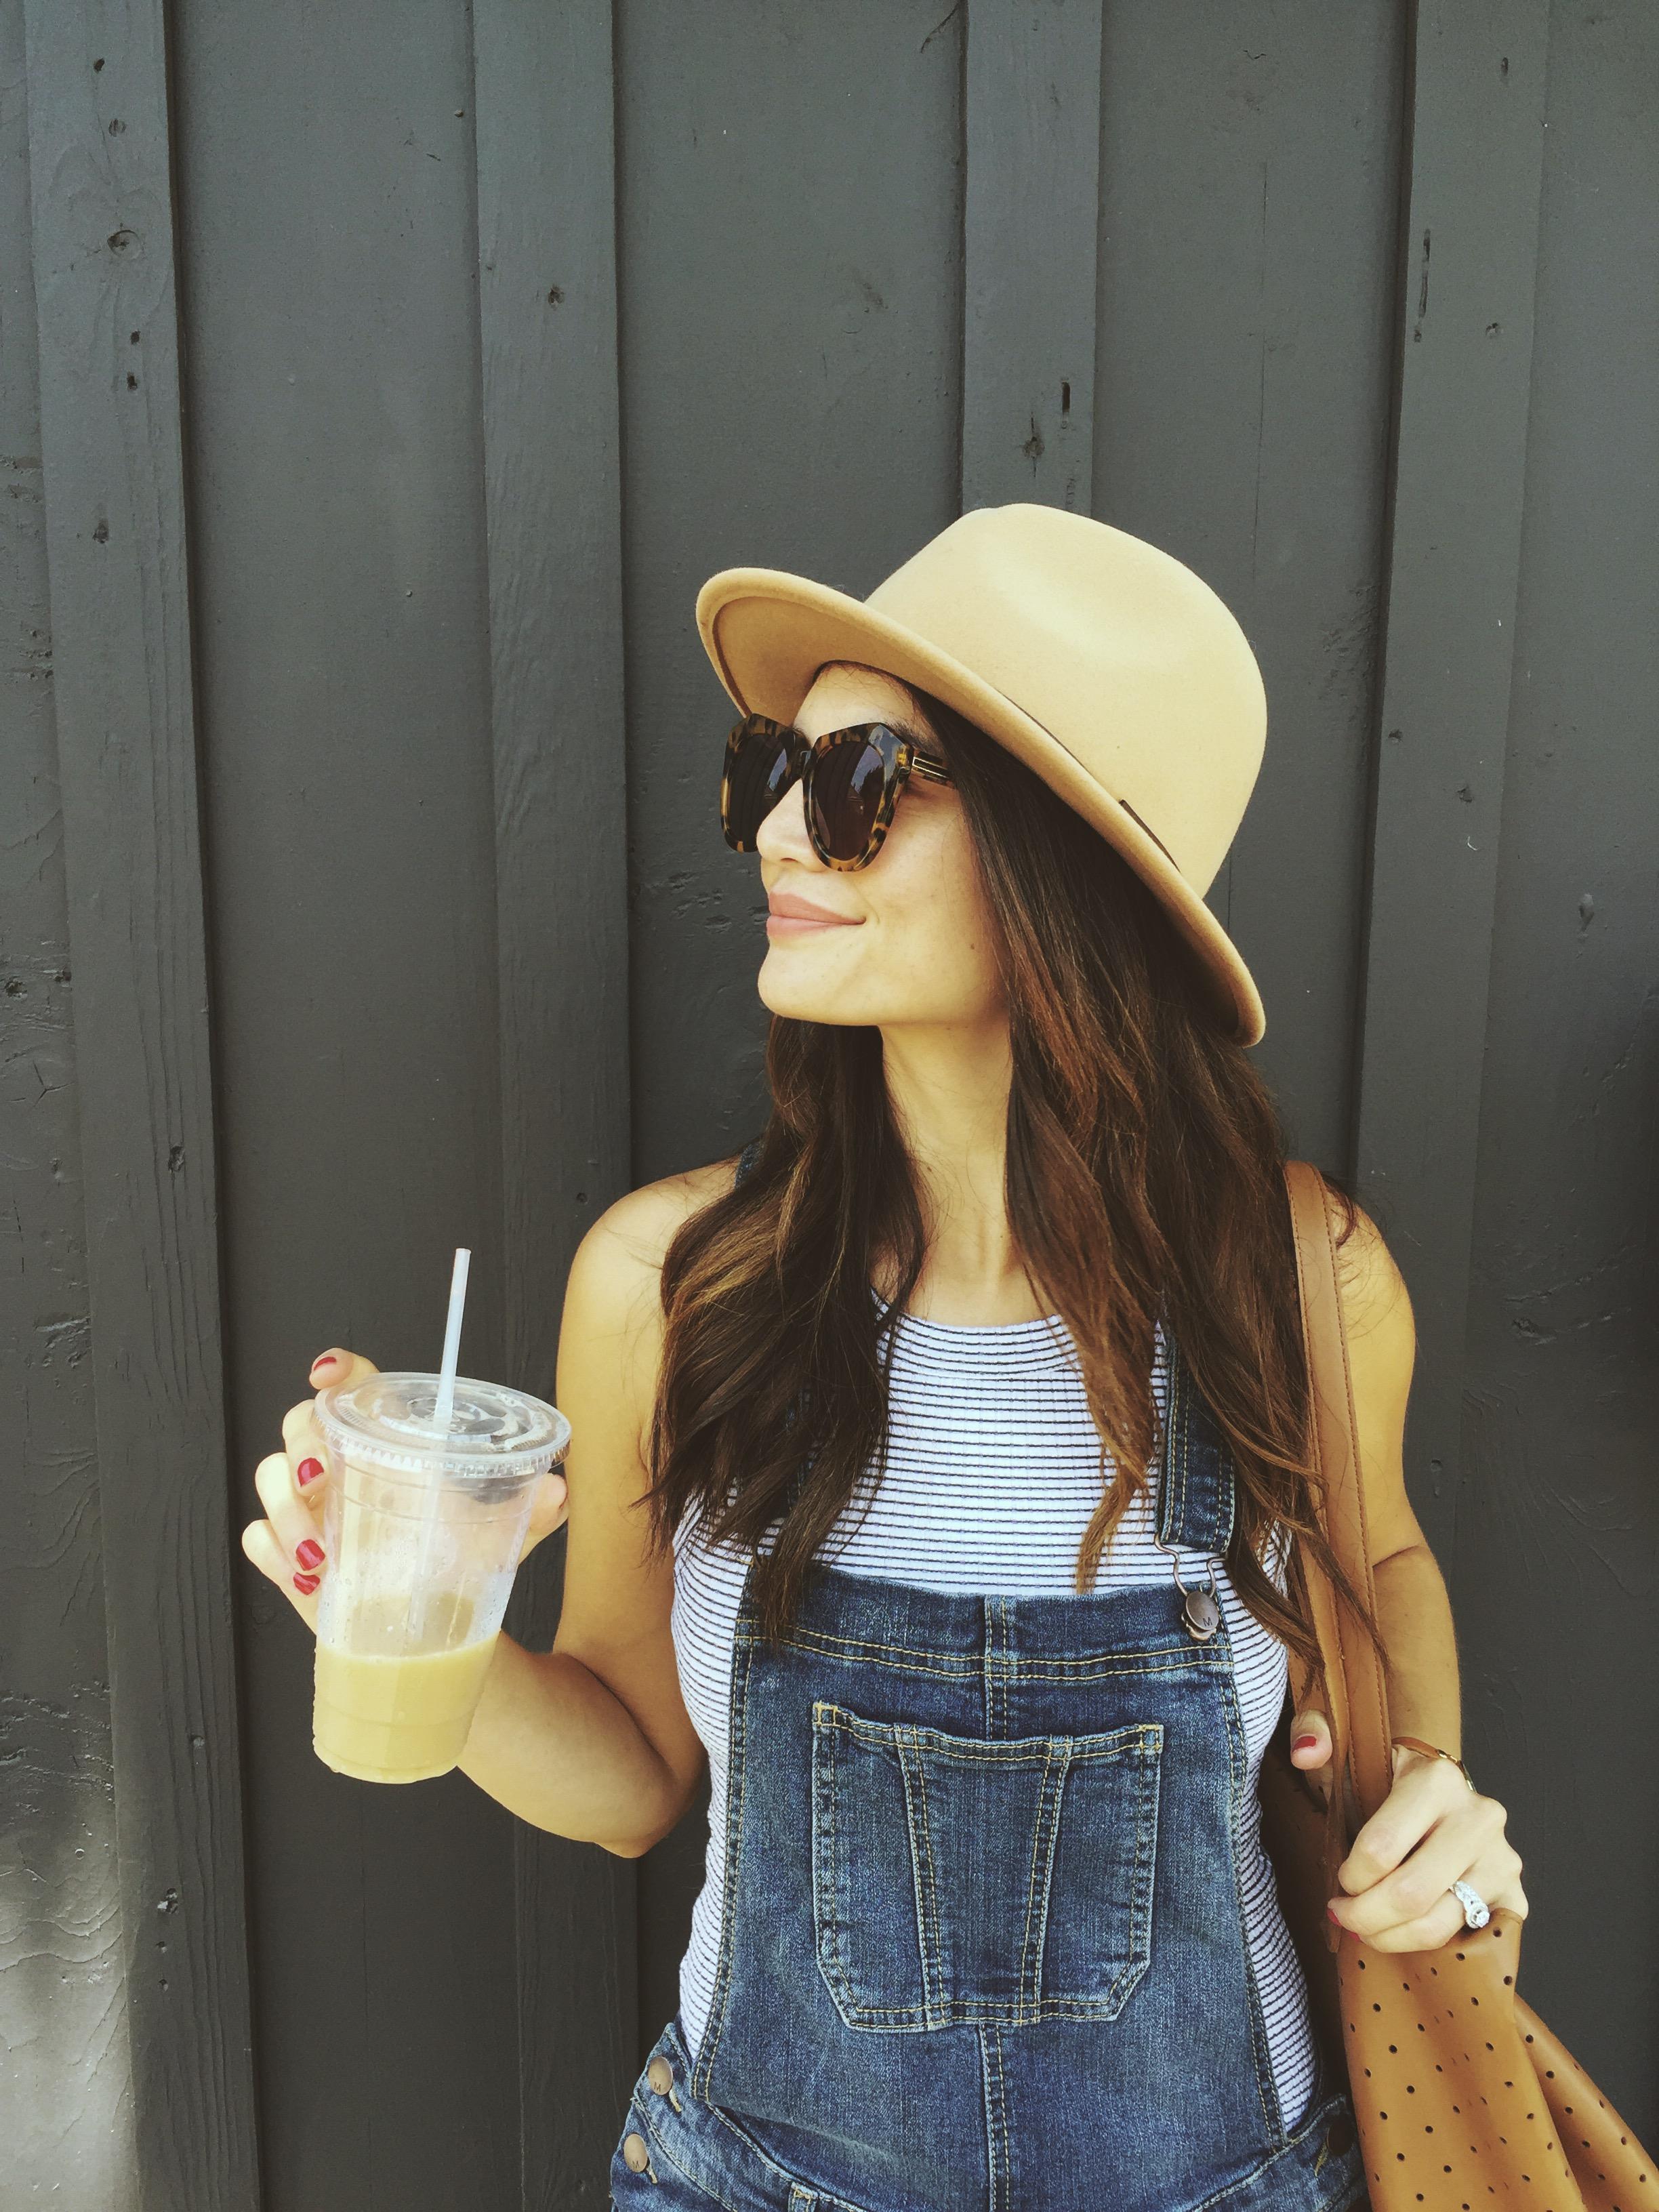 Overalls: Target. Shirt: Zara. Bag: similar  here . Hat: Urban Outfitters, old. Sunglasses:  Karen Walker .